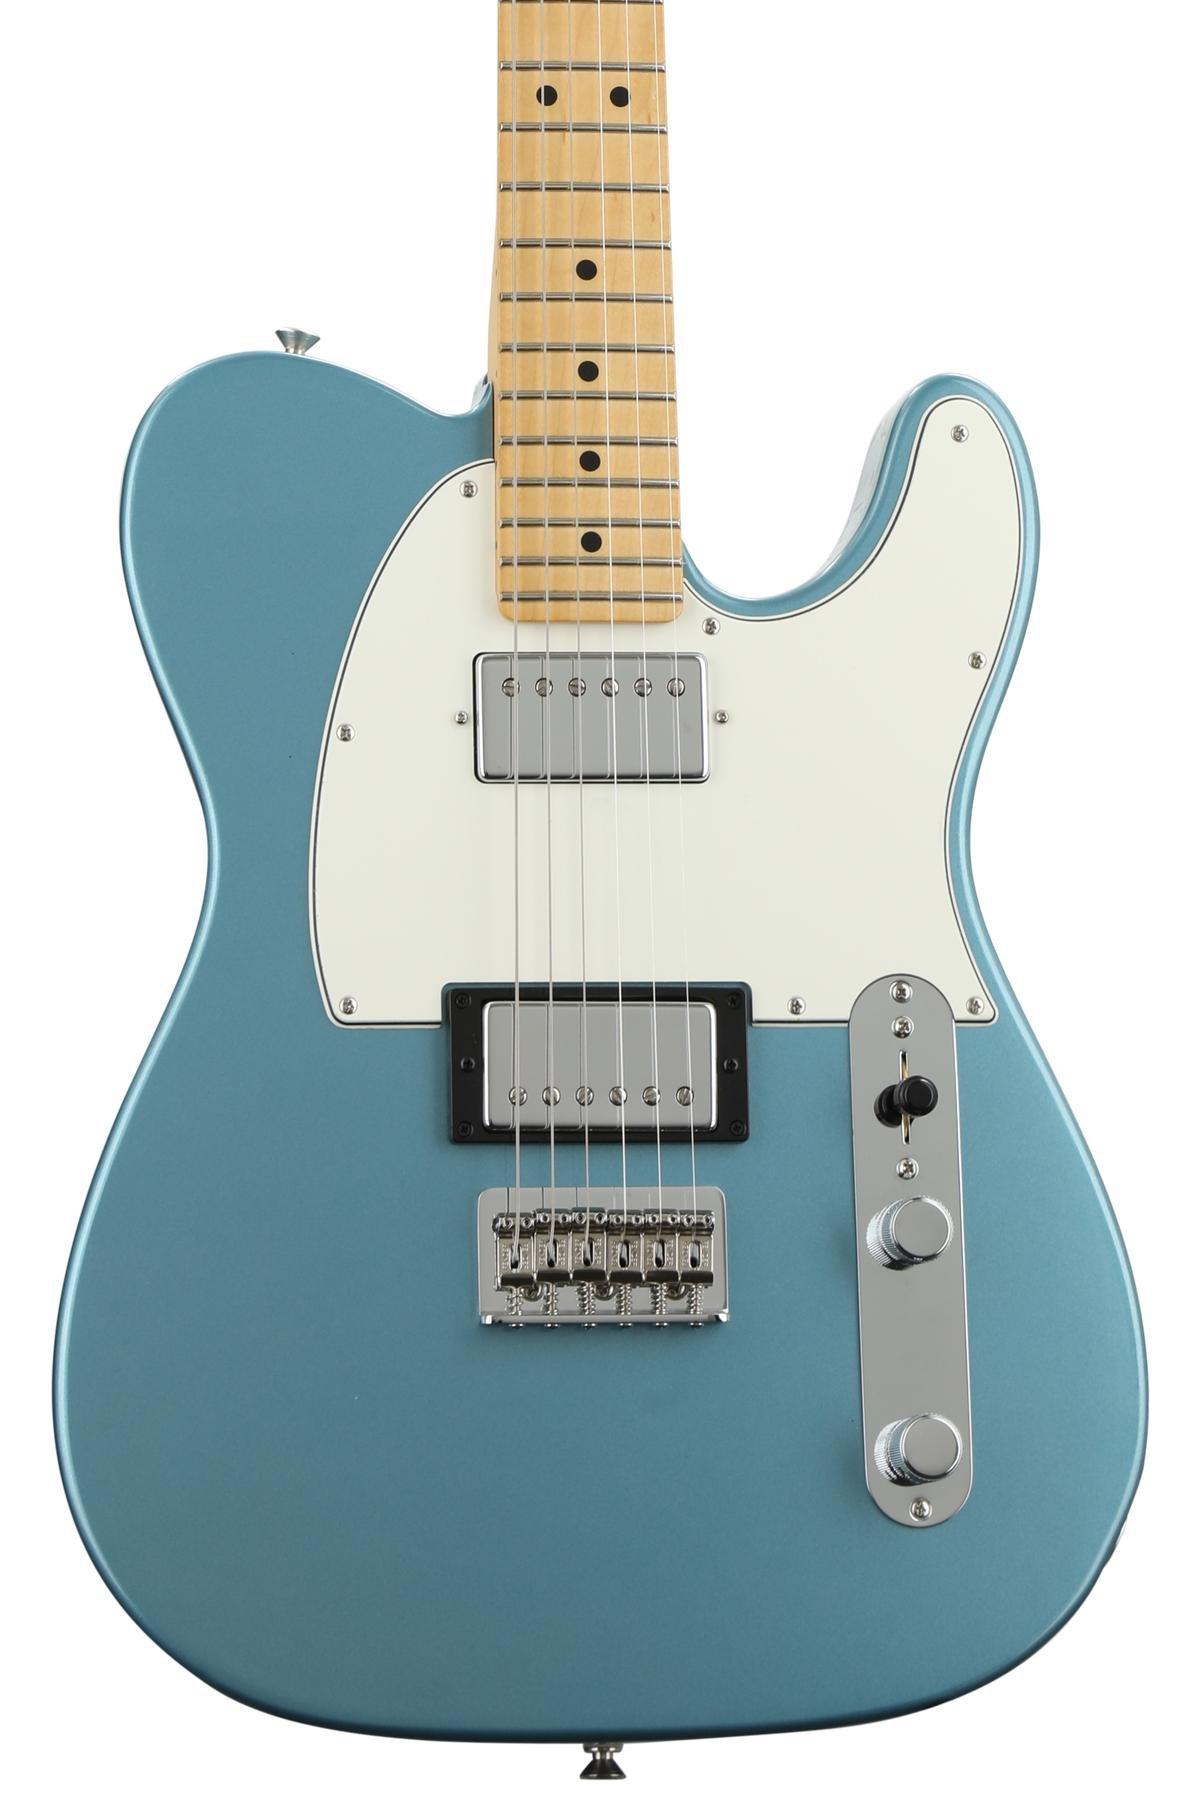 Fender Player Series Telecaster Hh Tidepool W Maple Fingerboard Wiring Diagram 3 Way 1 Humbucker Image